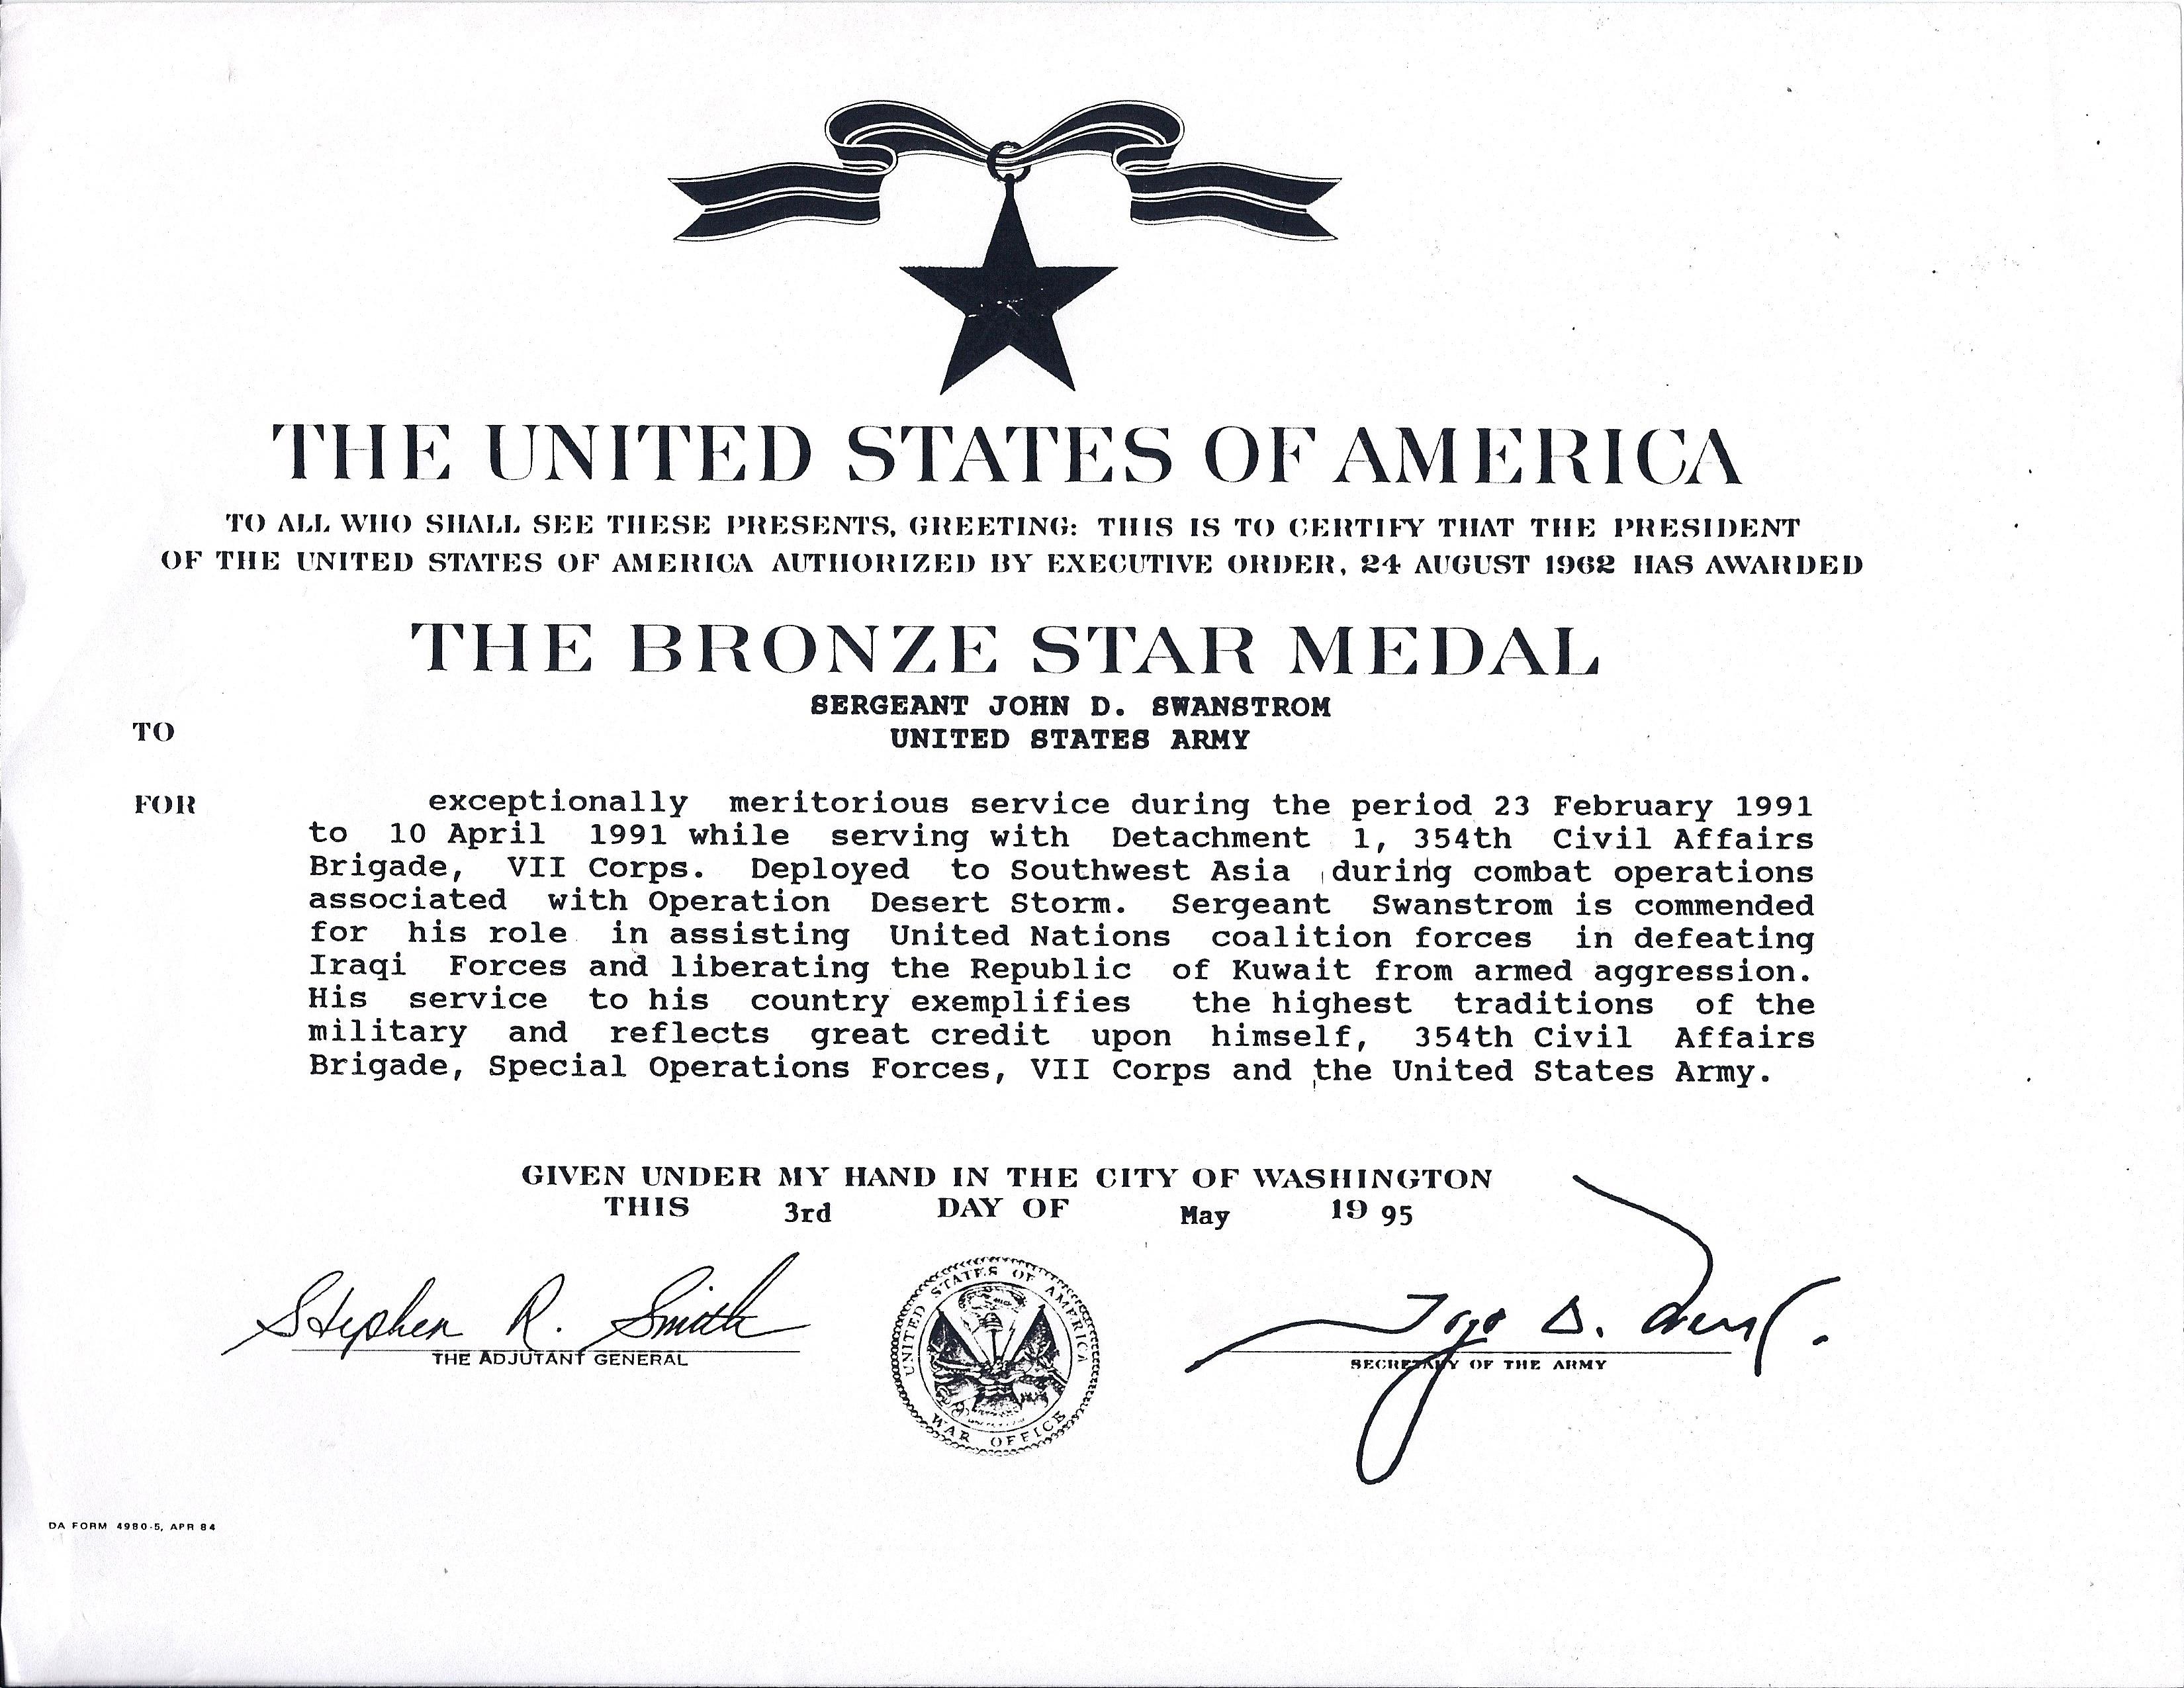 Filebronze Star Medal Jackswanstromg Wikimedia Commons